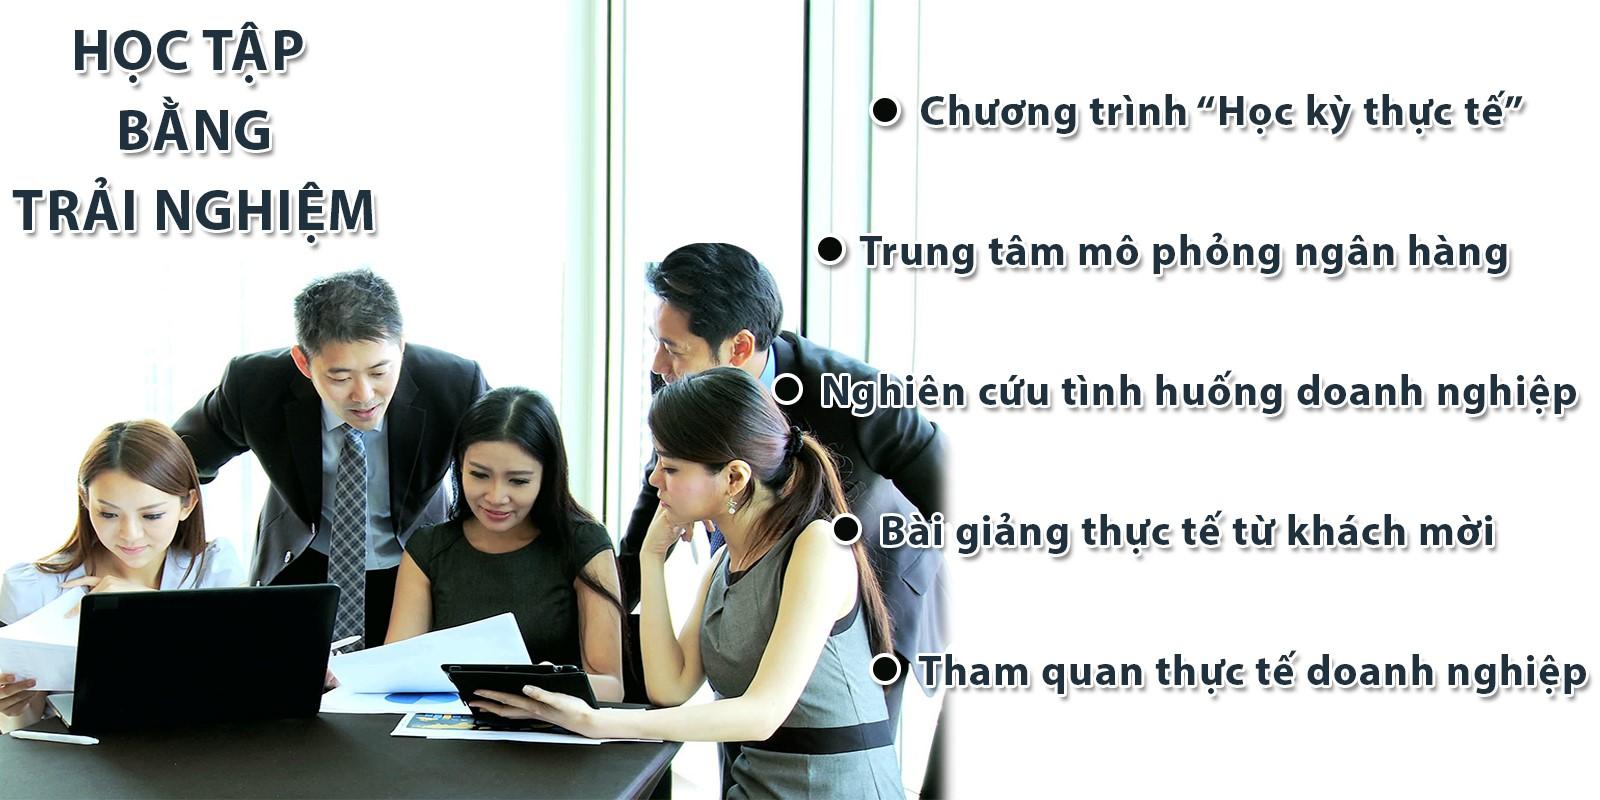 hoc_tap_bang_trai_nghiem-copy